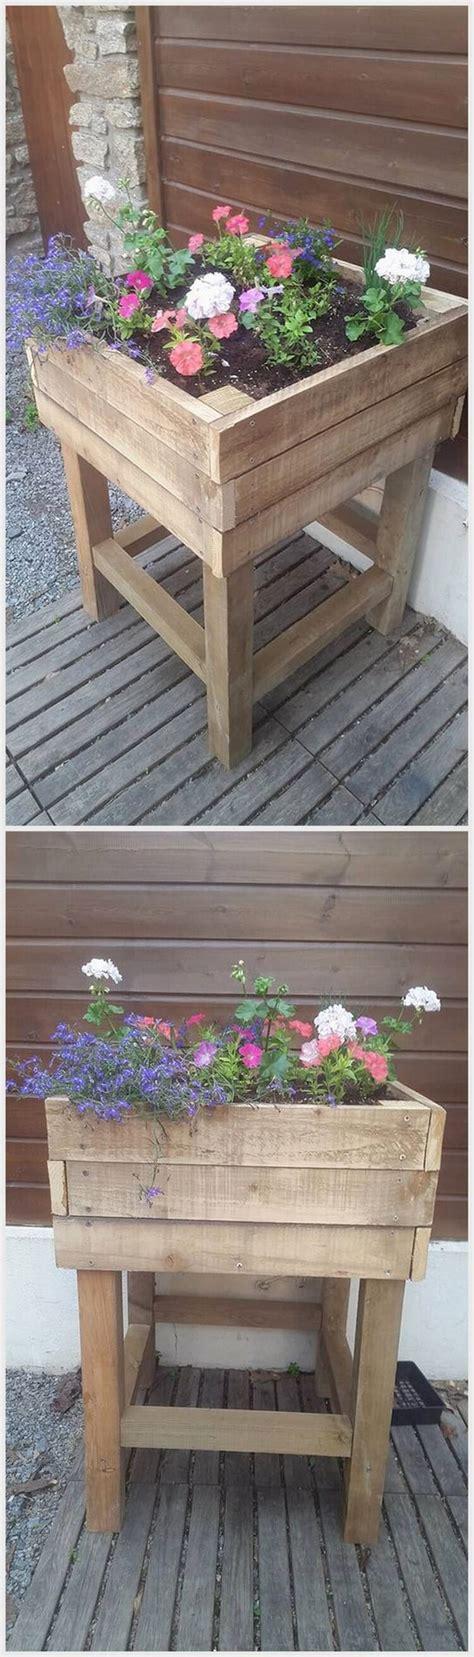 genius ideas  wooden pallet recreations pallet wood